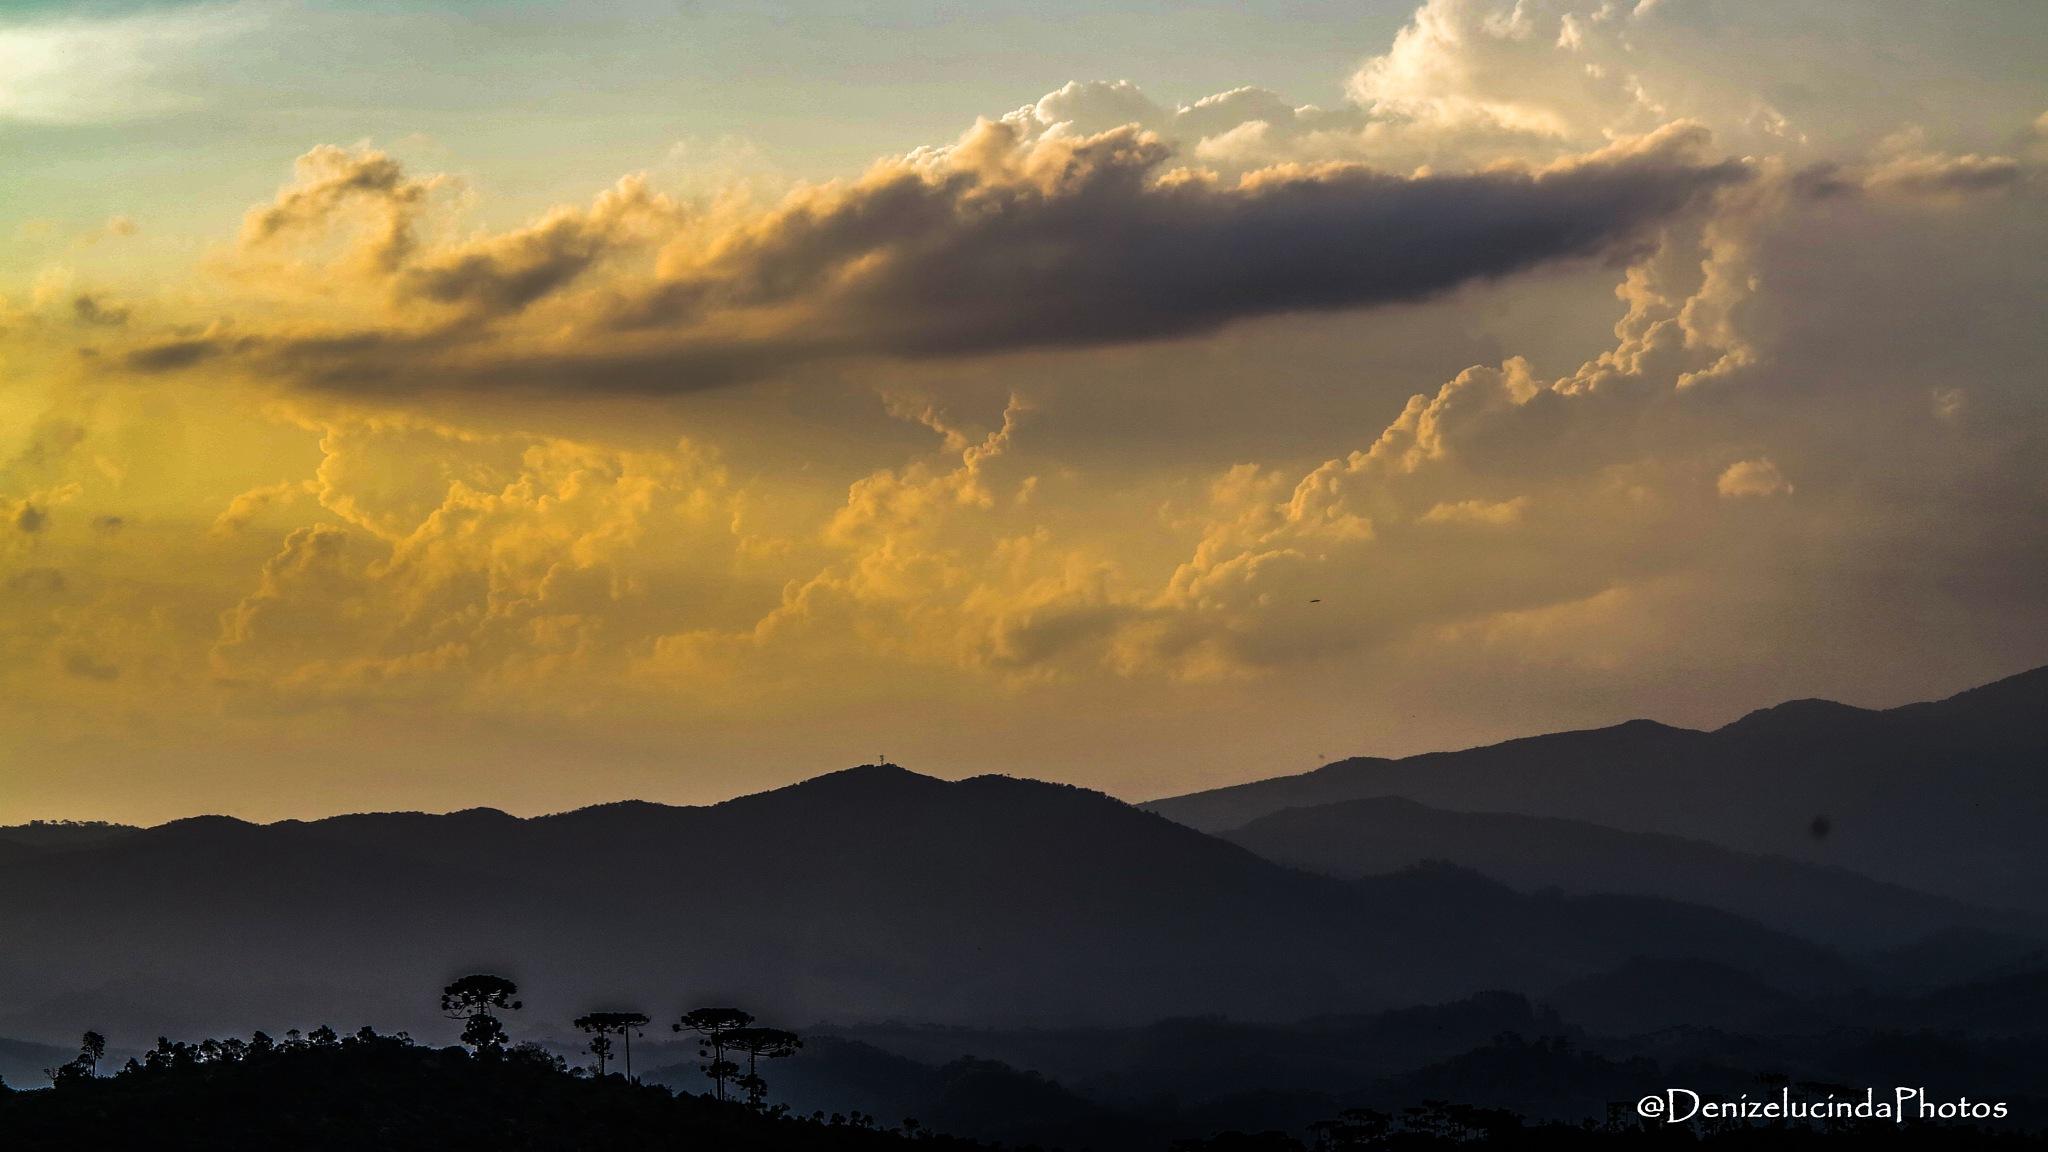 Sunset - Santo Antônio do Pinhal - SP - Brasil by denizelucinda